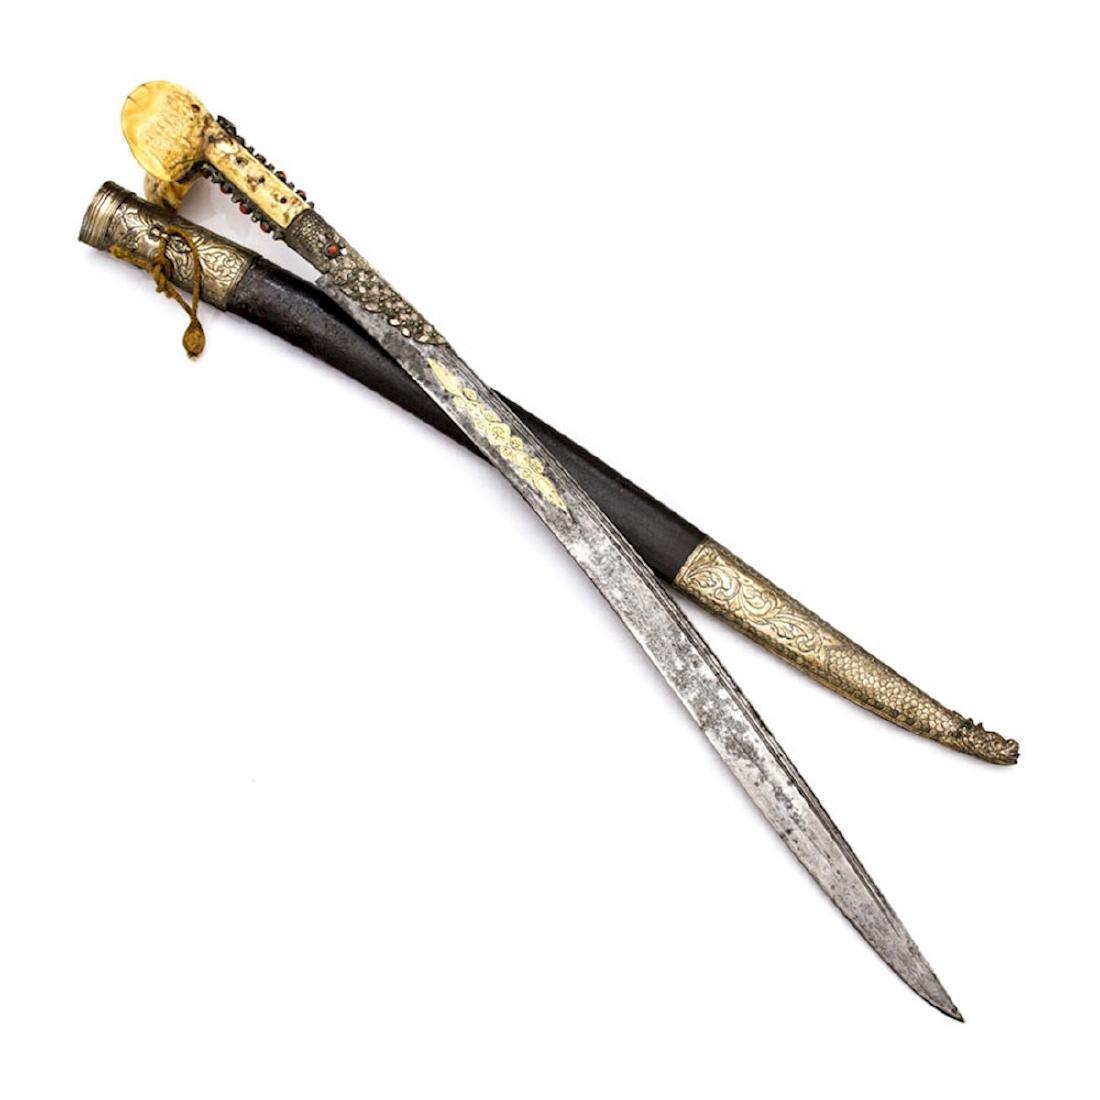 TURKISH YATAGAN SWORD WITH GOLD INLAY - 5